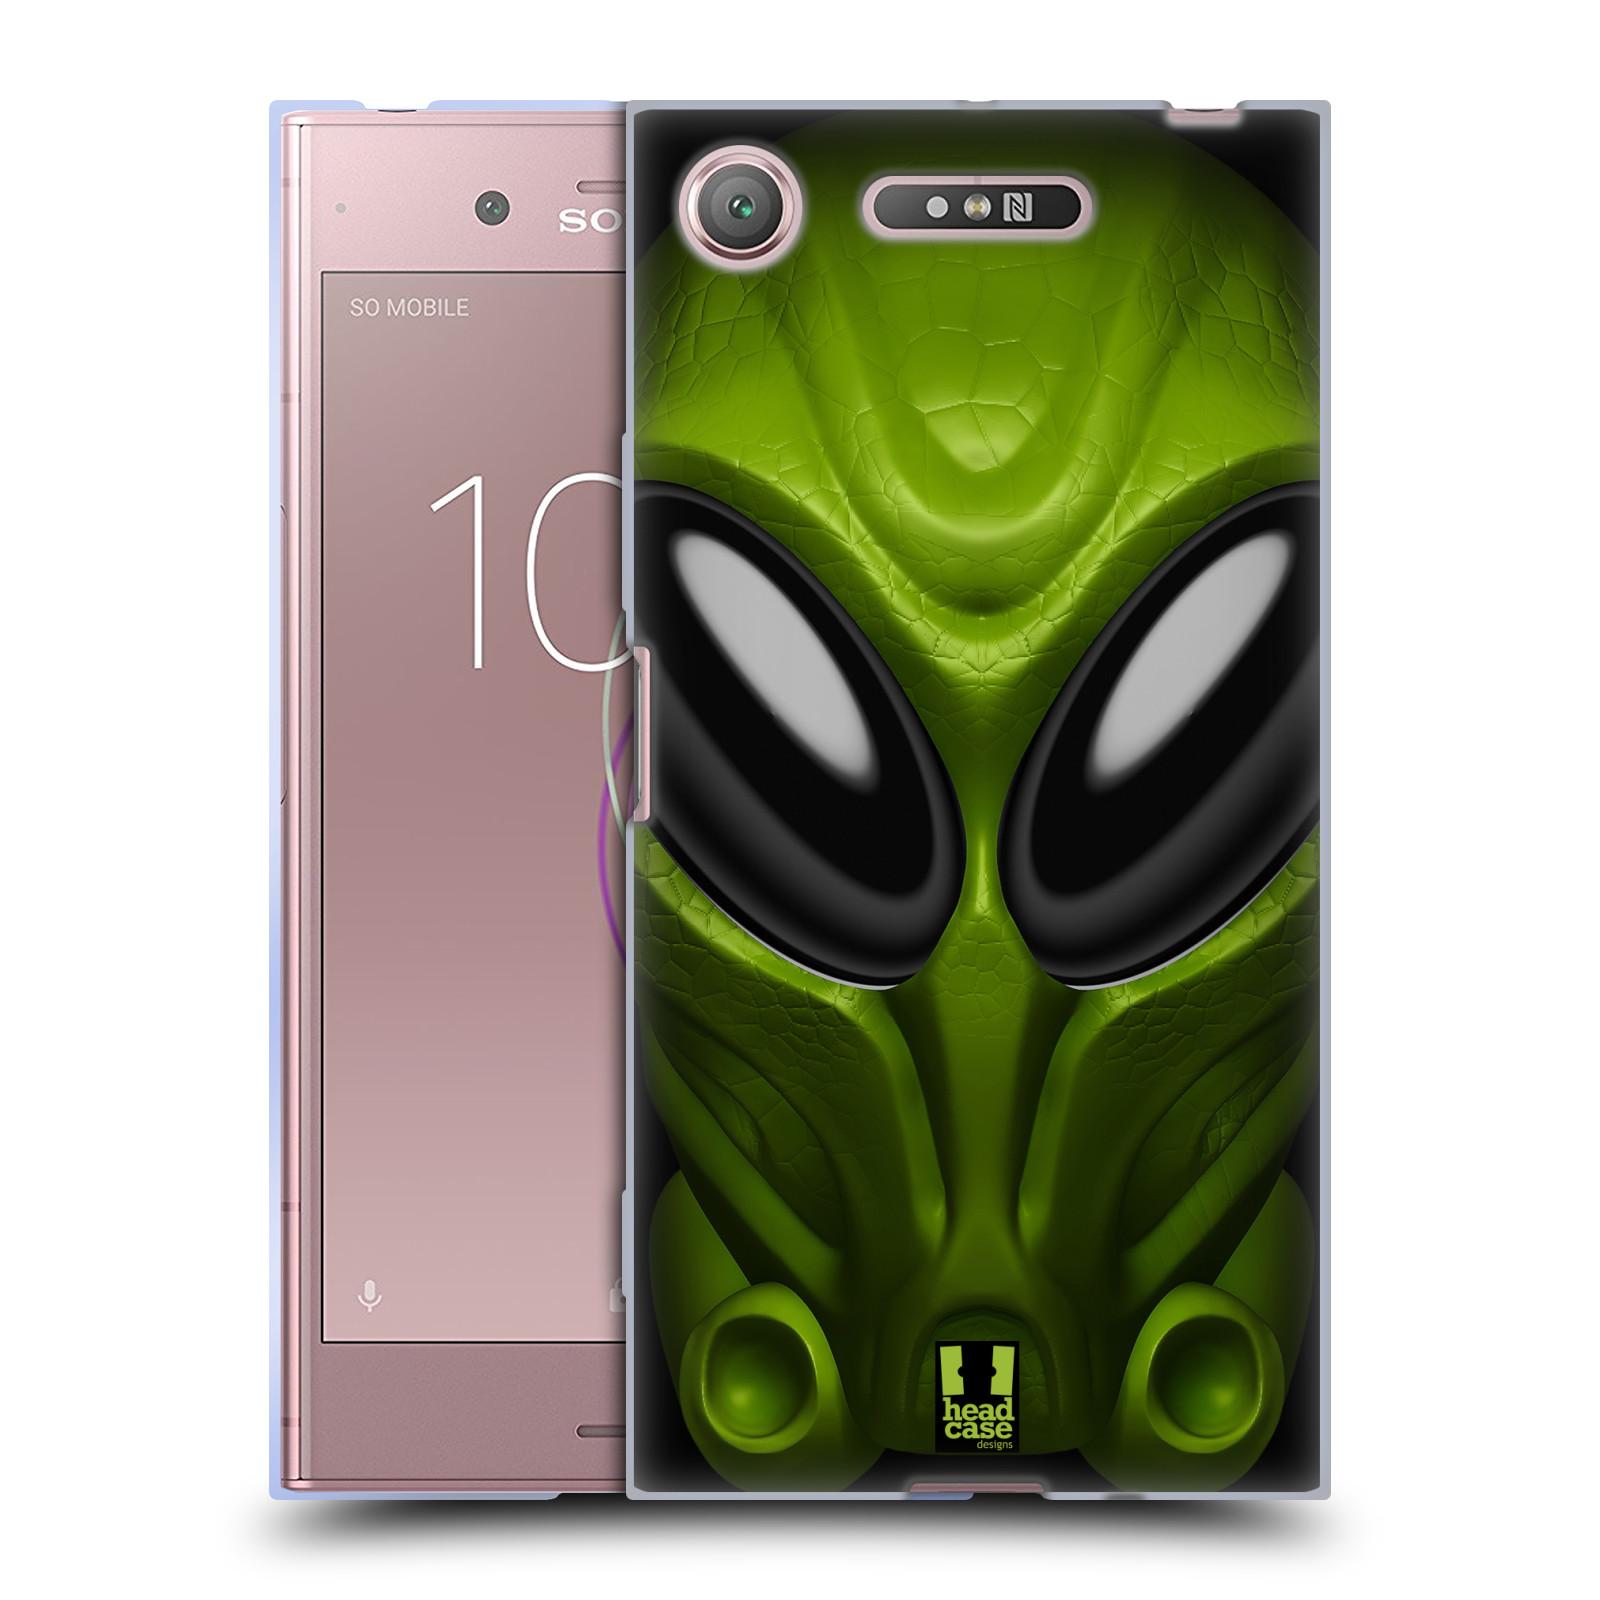 Silikonové pouzdro na mobil Sony Xperia XZ1 - Head Case - Ufoun Mastermind